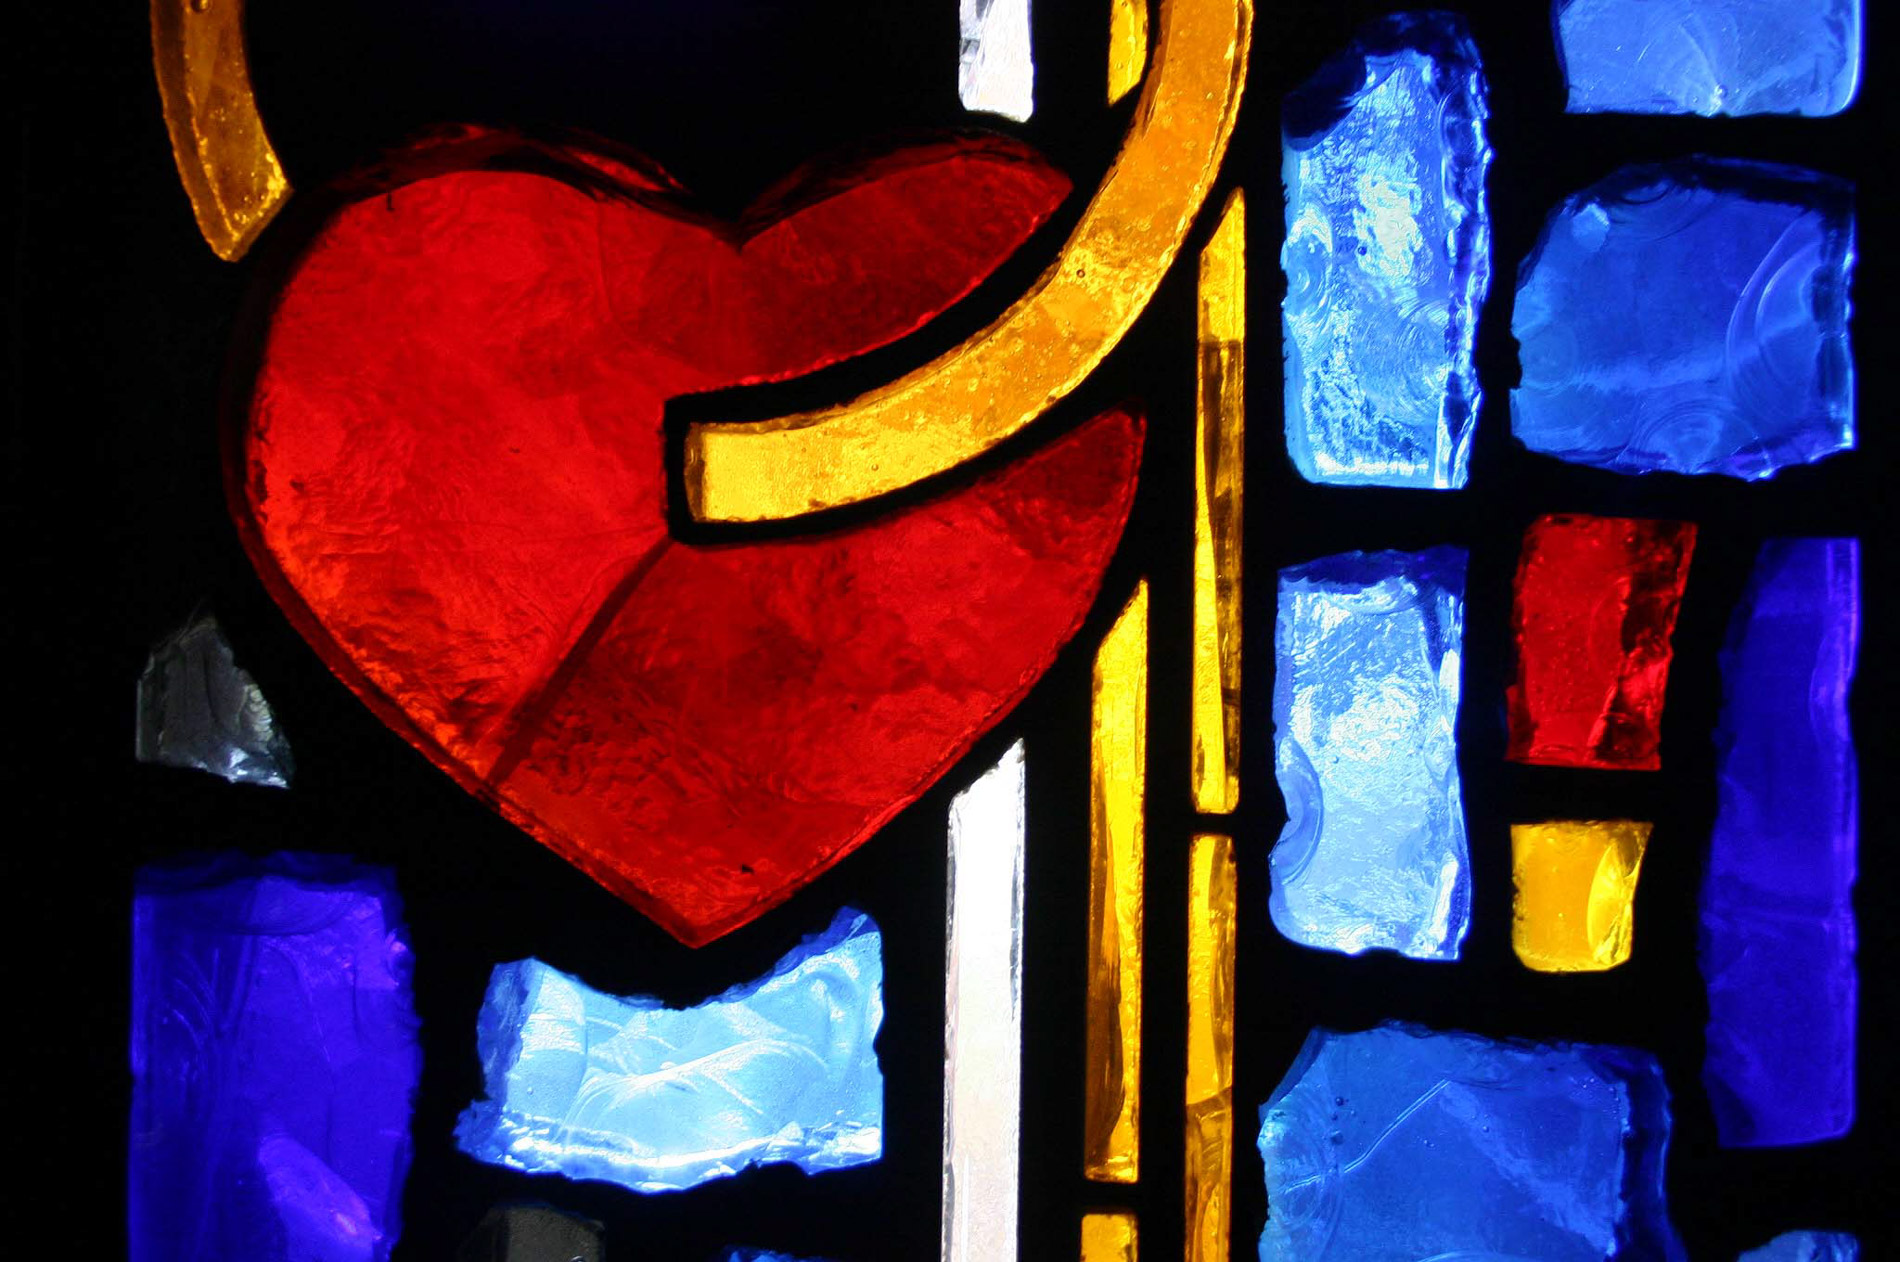 Why Love is the Theme – Benedict XVI